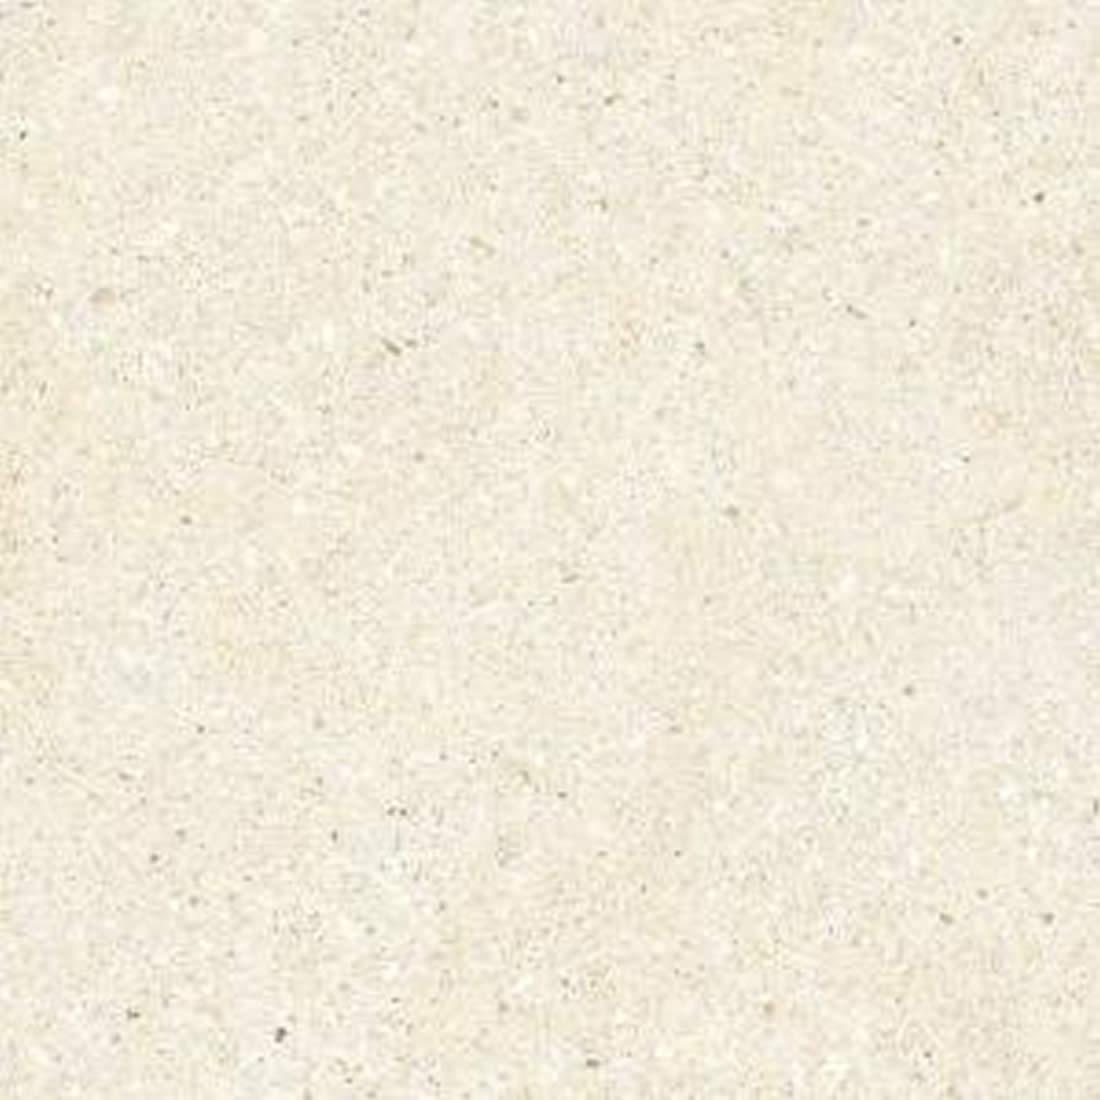 Piso Incefra 57 x 57 Granilhado HD Ref 57170